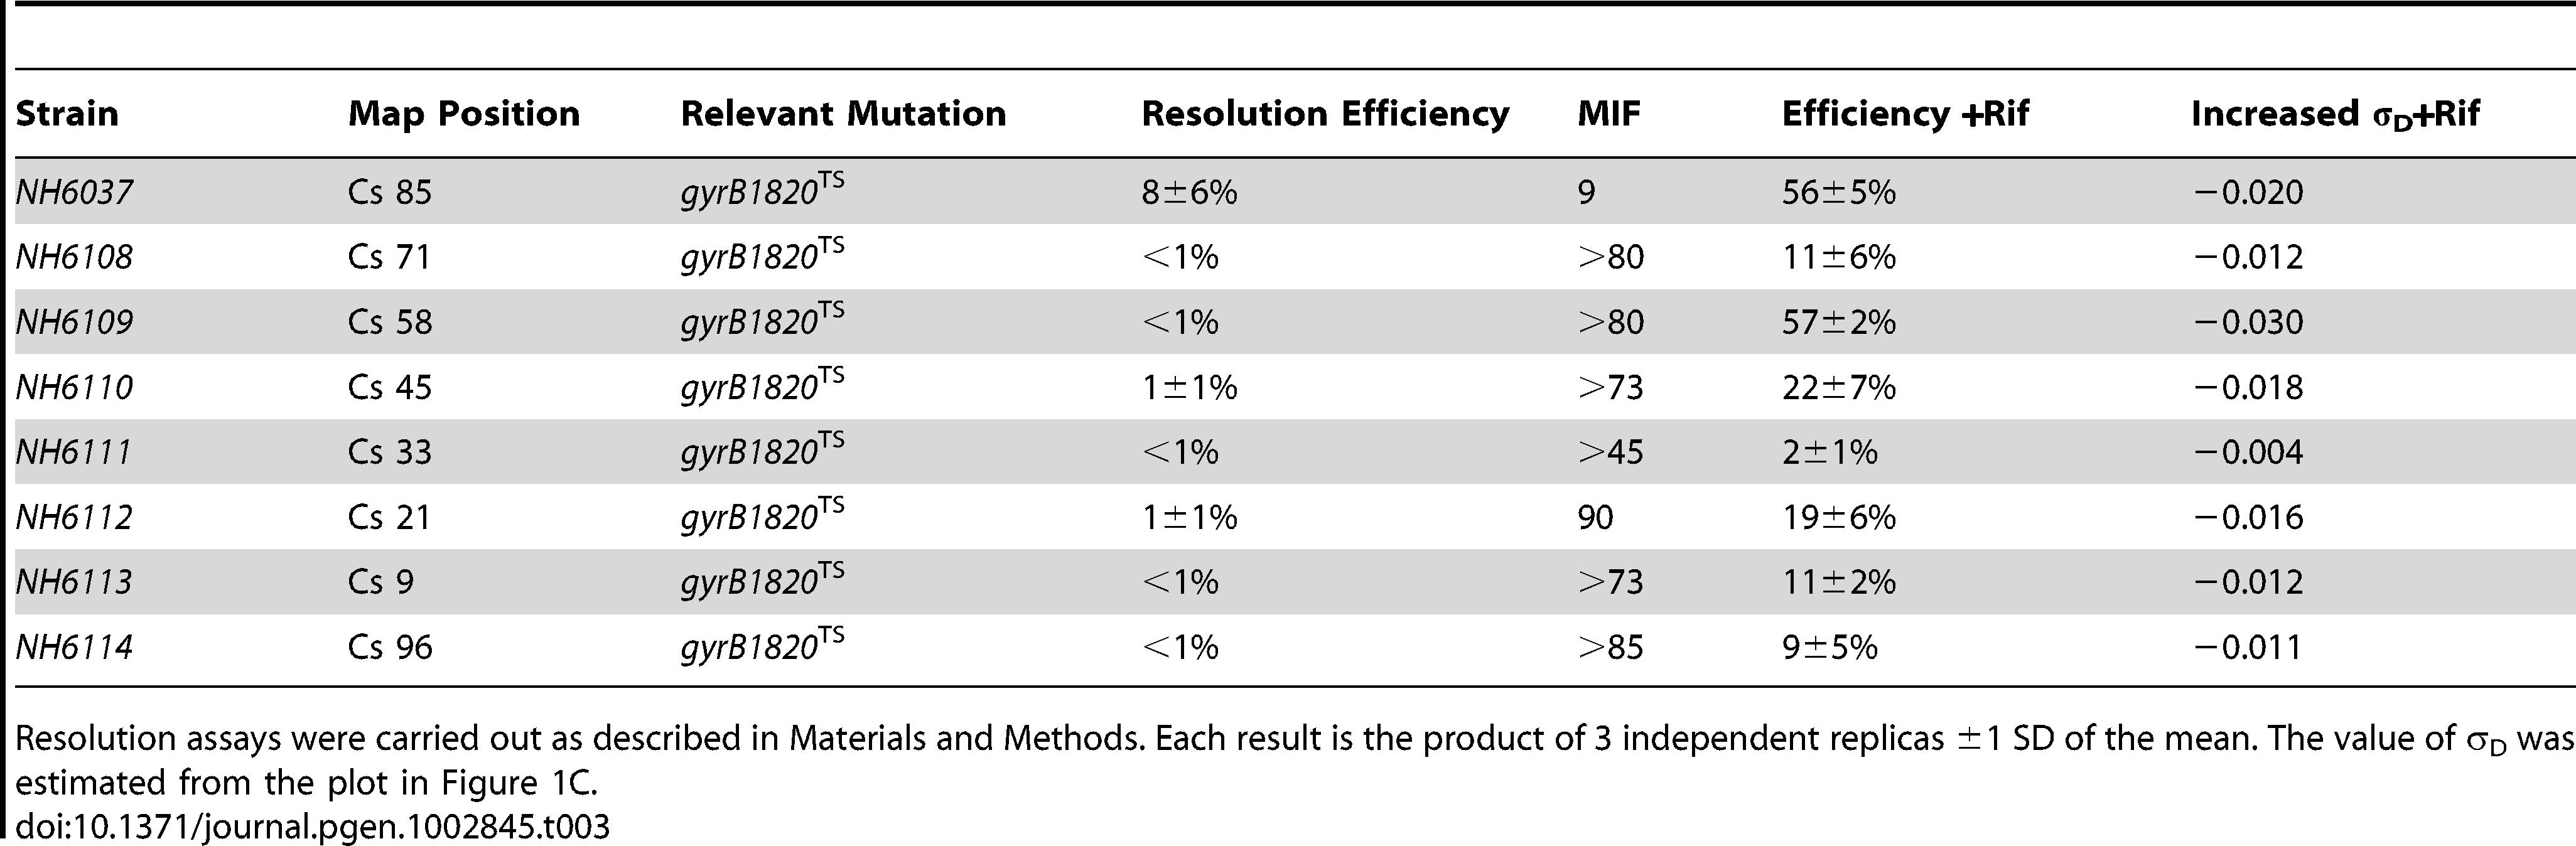 Rifampicin induced recovery of chromosomal σ<sub>D</sub> in <i>gyrB1820</i> mutants.